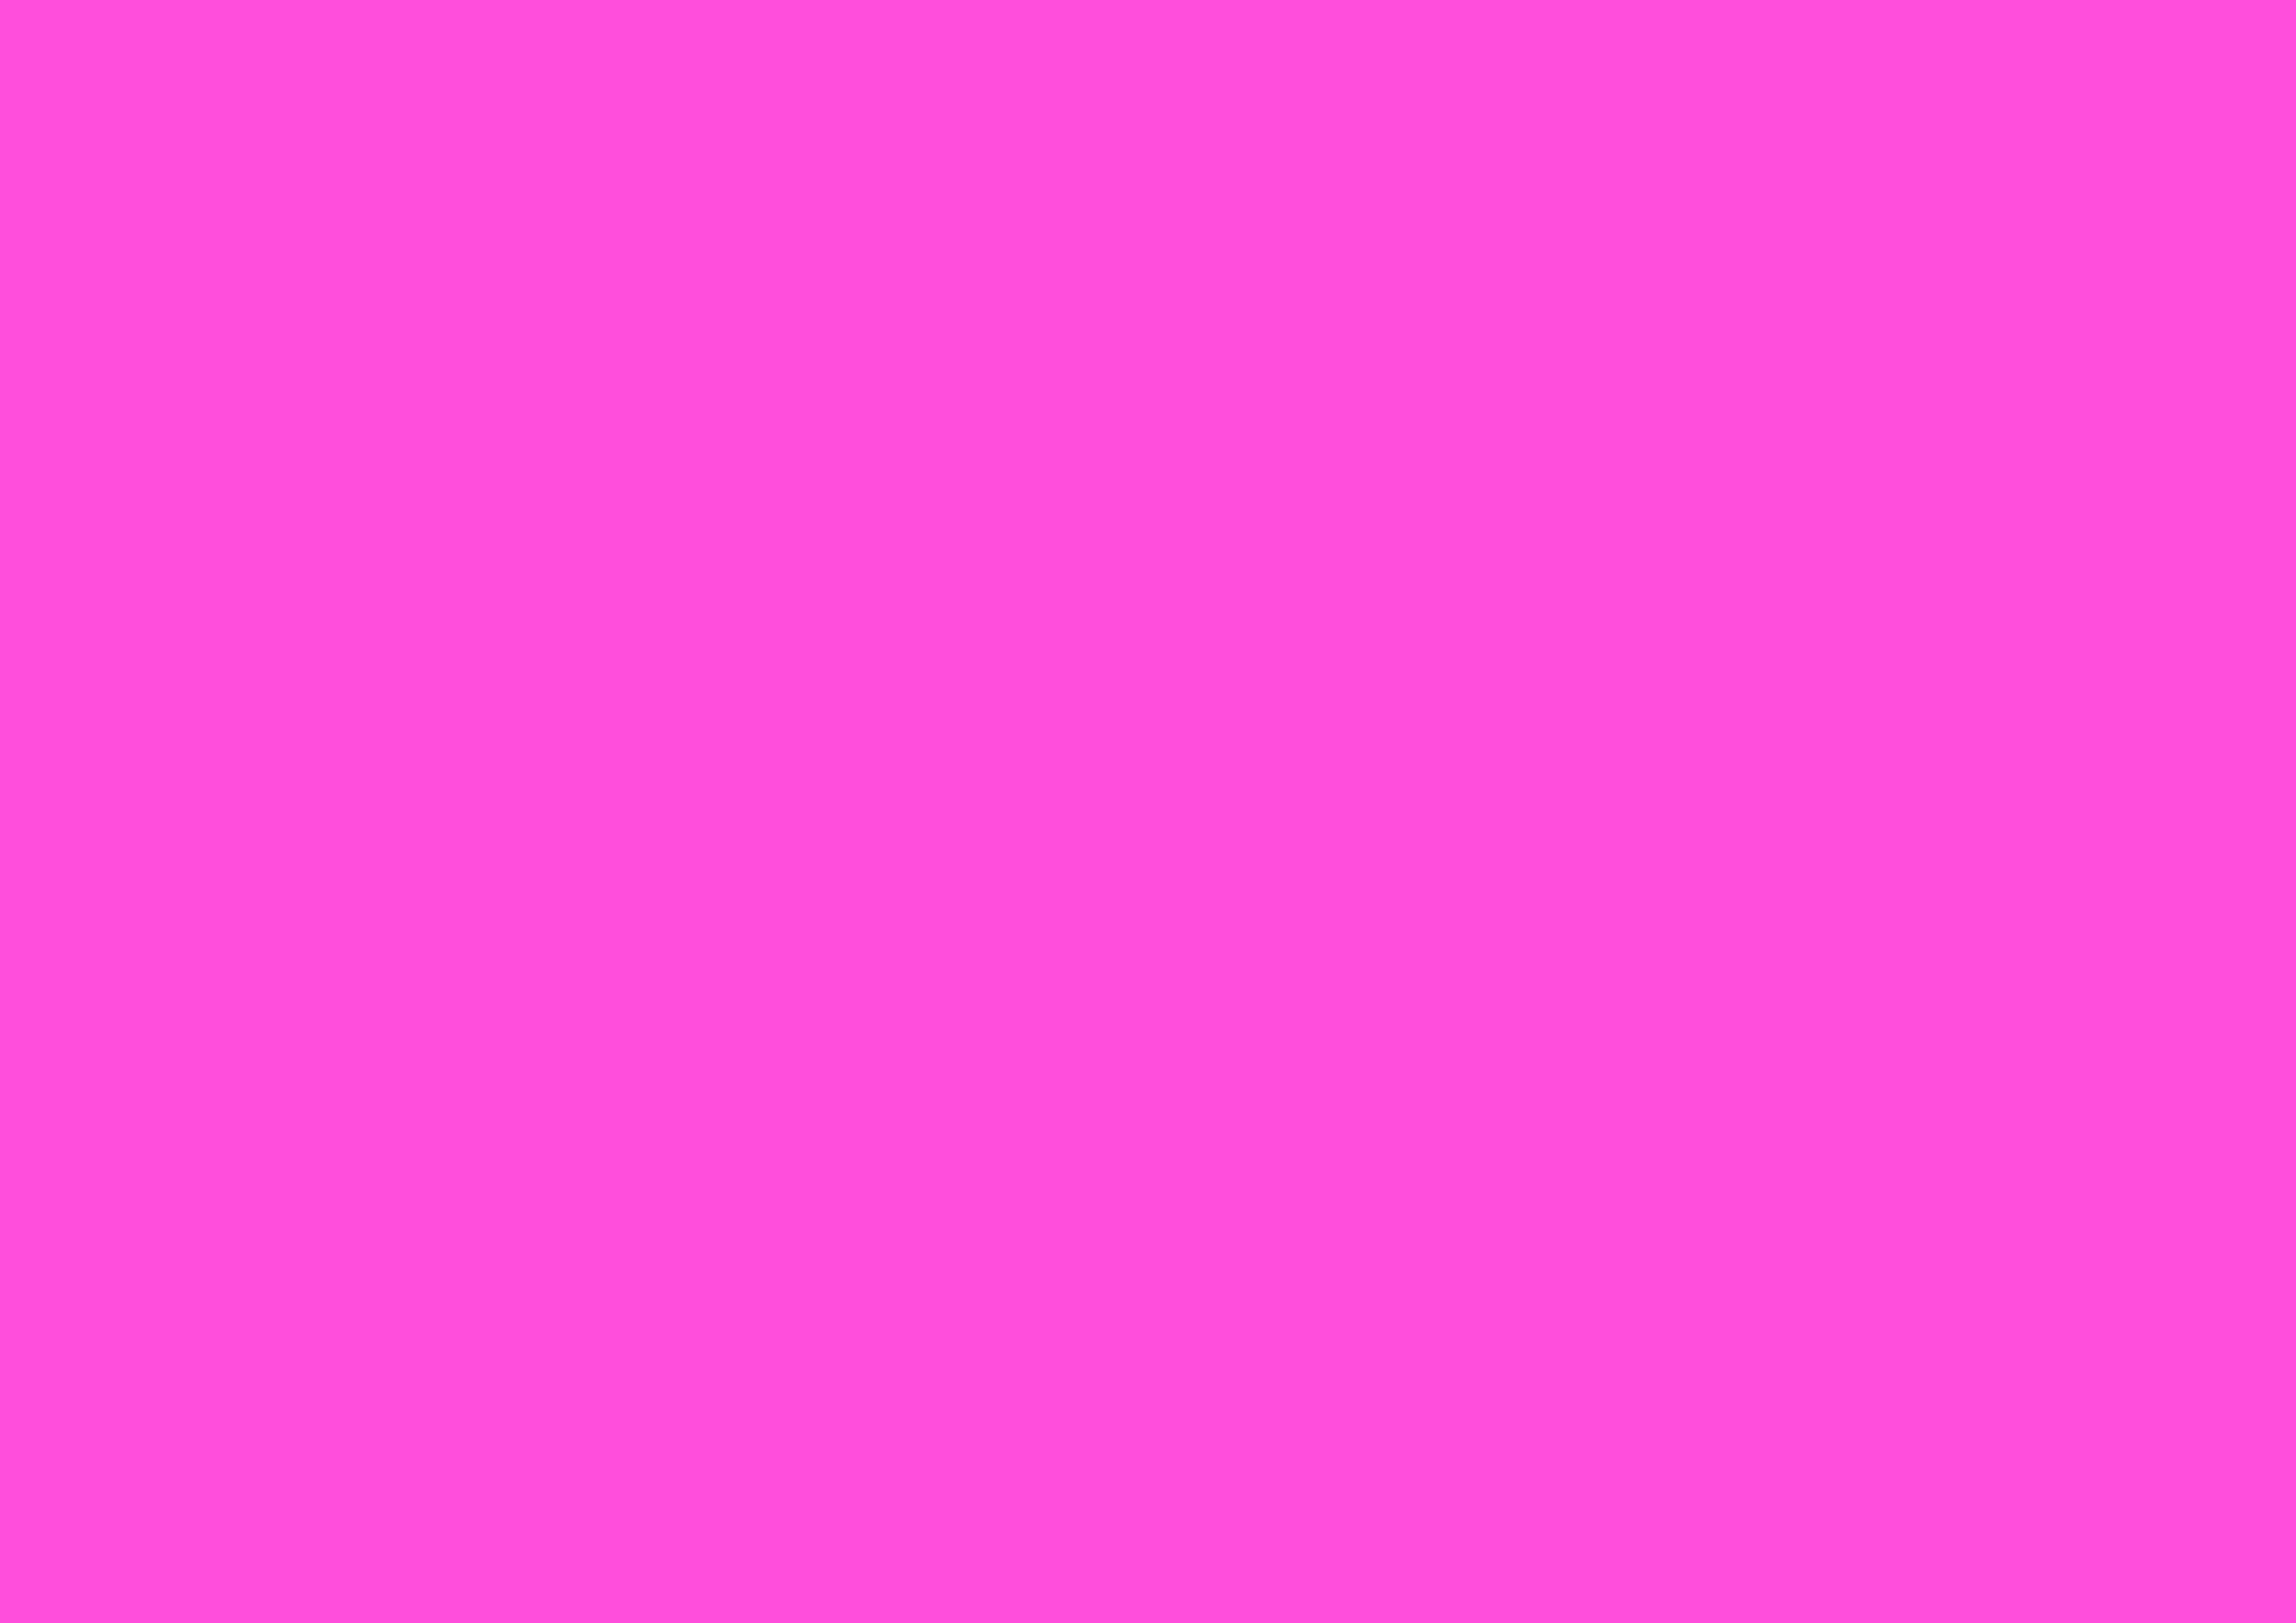 3508x2480 Purple Pizzazz Solid Color Background